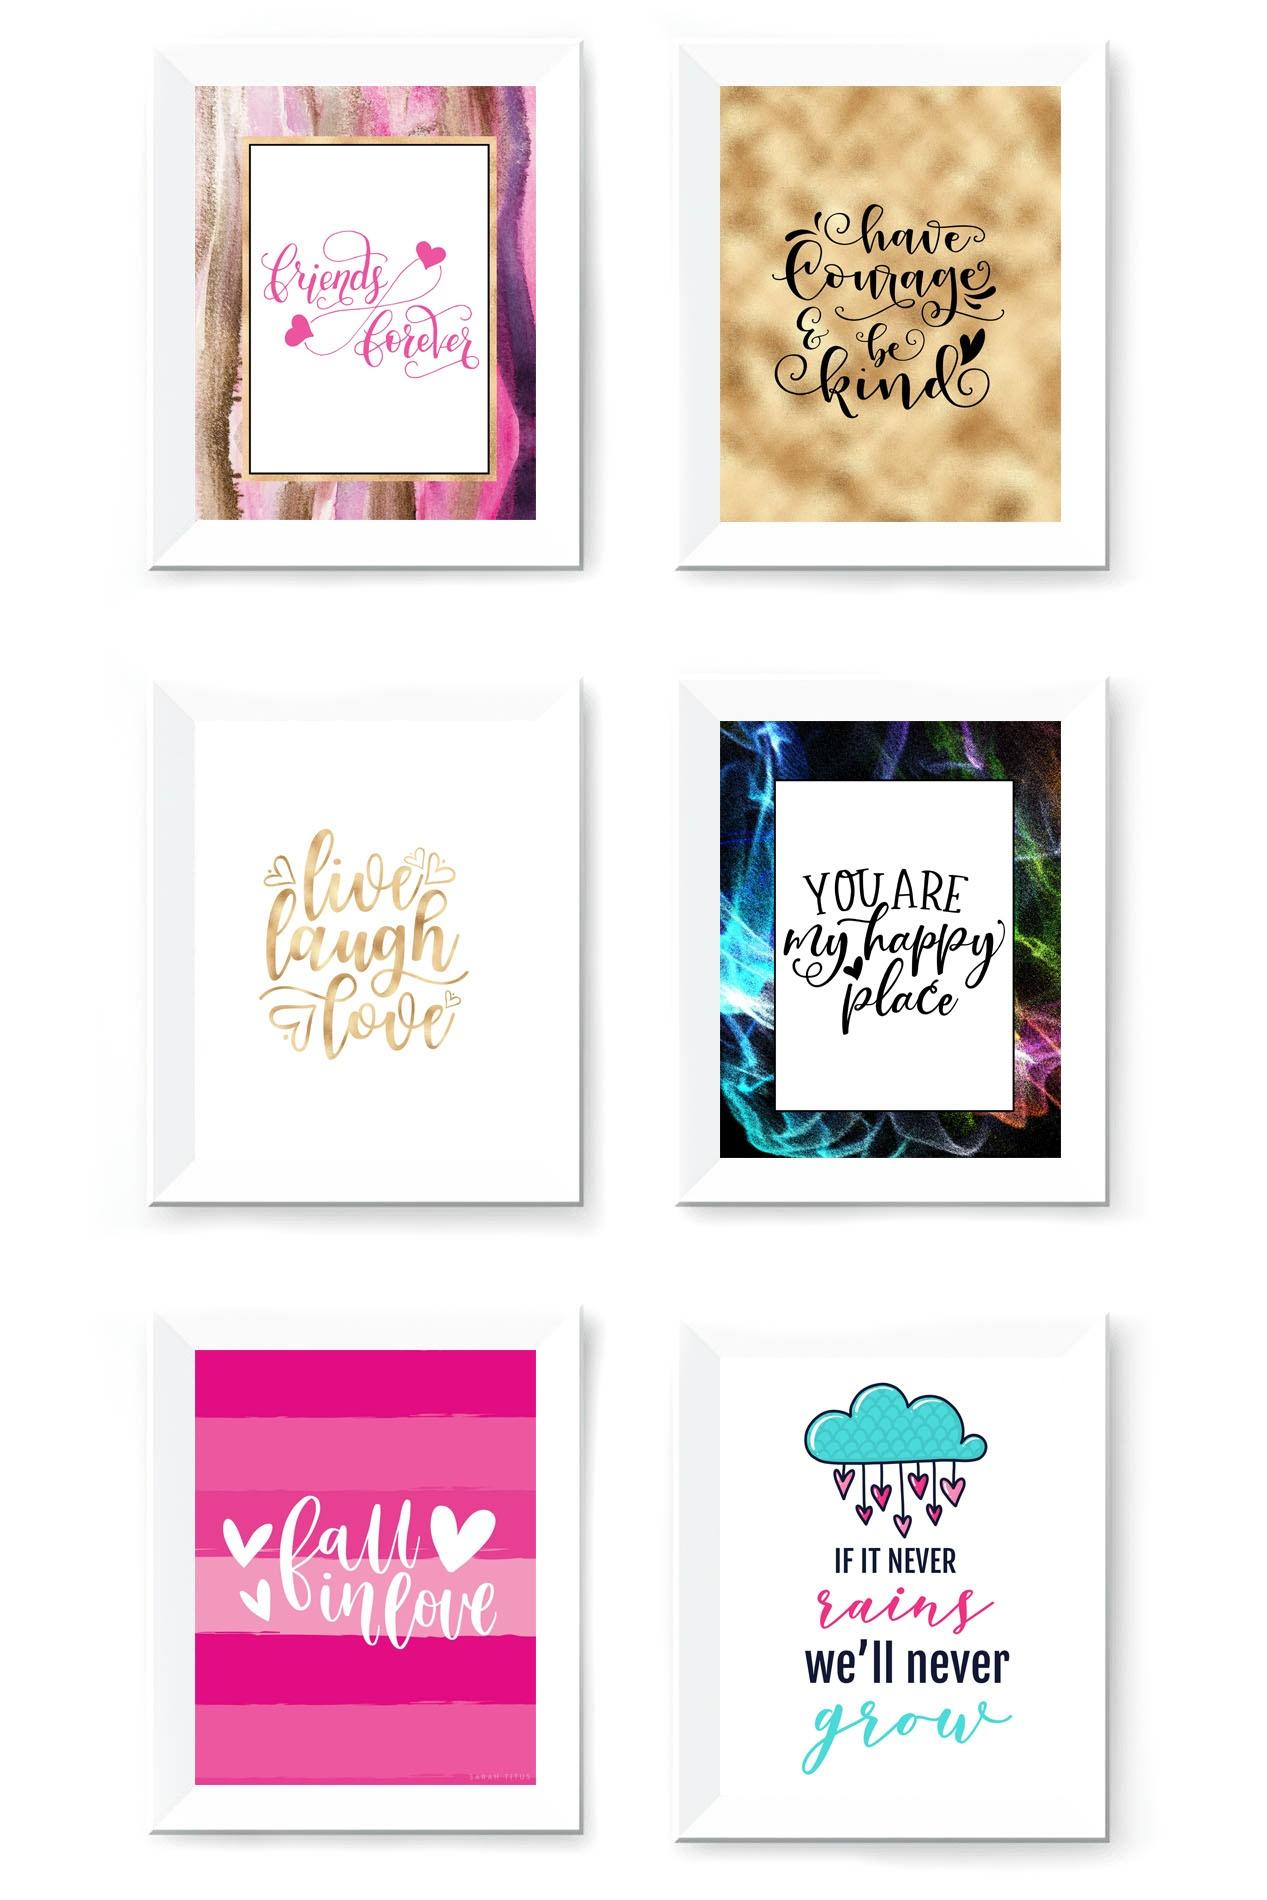 Free Printable Wall Art To Download Now - Sarah Titus - Free Printable Images